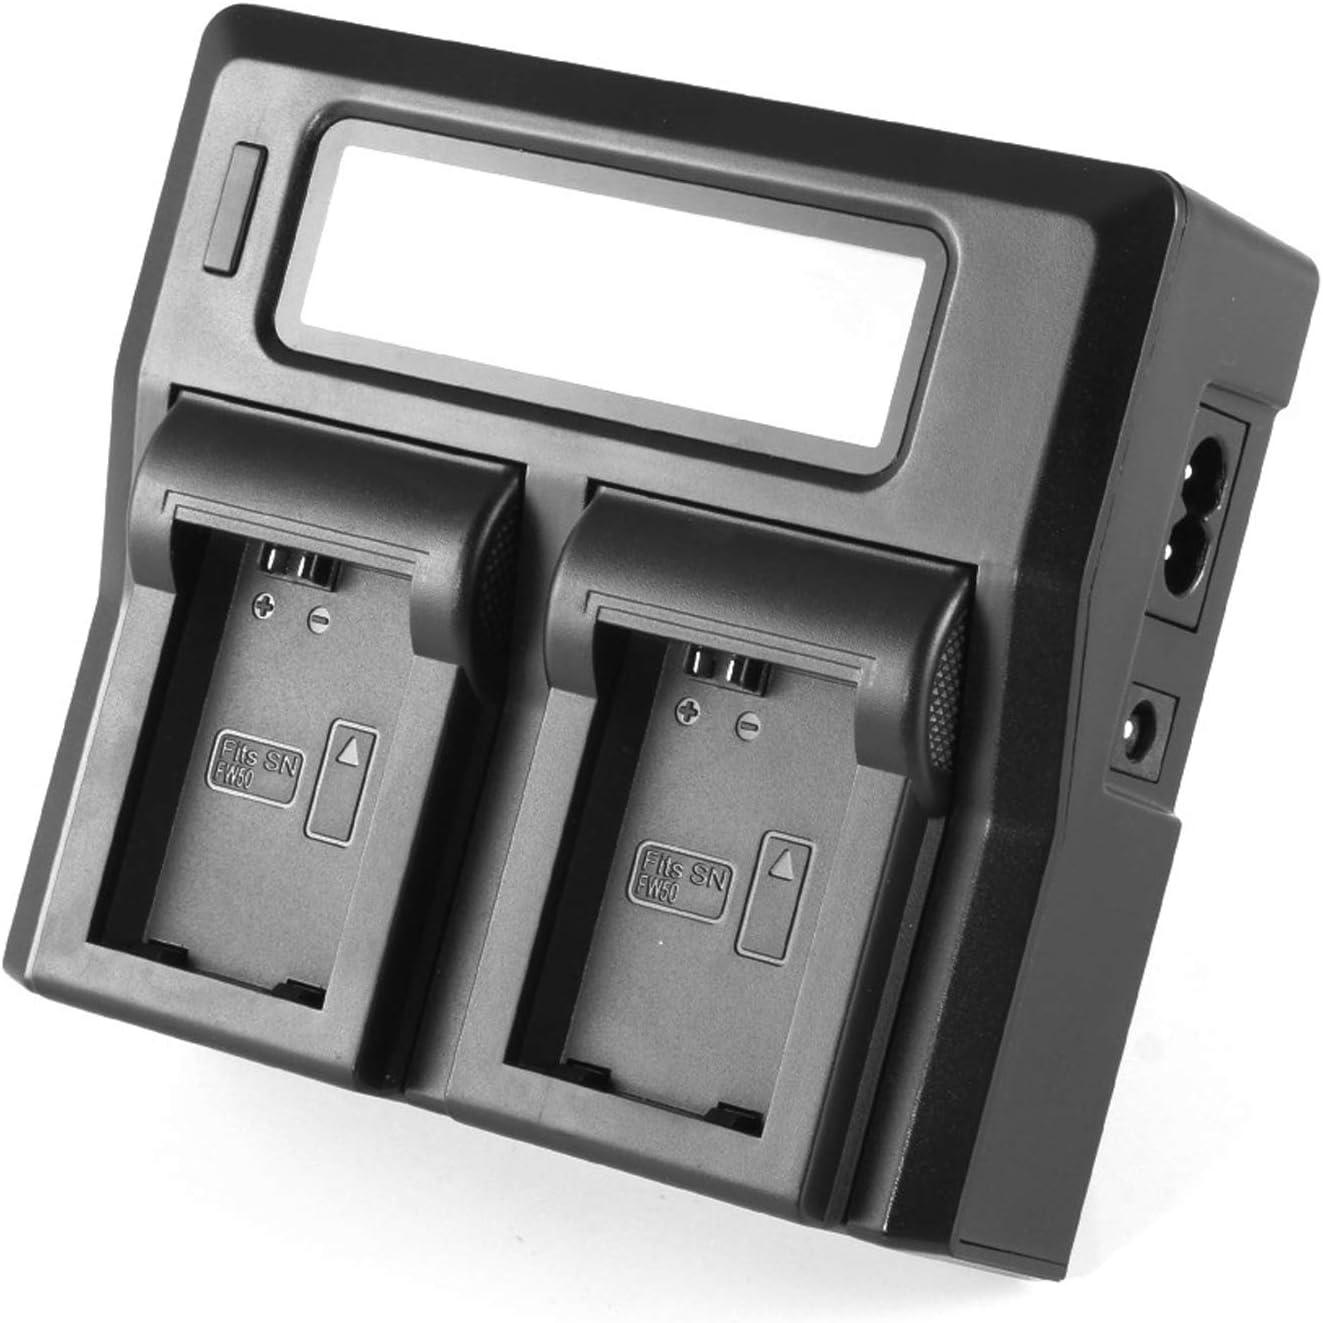 DCR-SR220 DCR-SR220D Handycam Camcorder USB Travel Battery Charger for Sony DCR-SR210